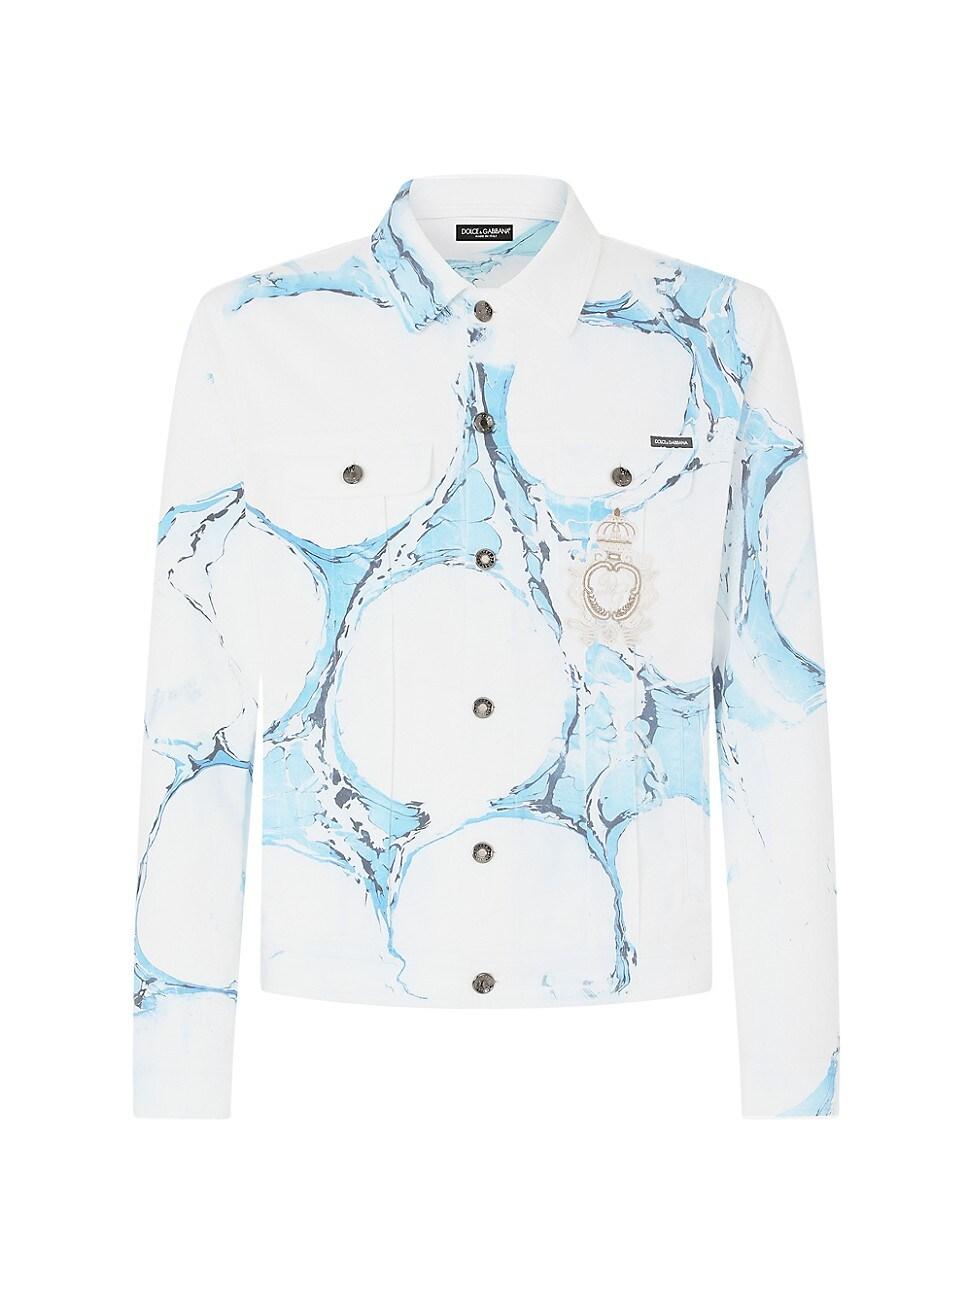 Dolce & Gabbana MEN'S BLEACHED PRINT DENIM JACKET